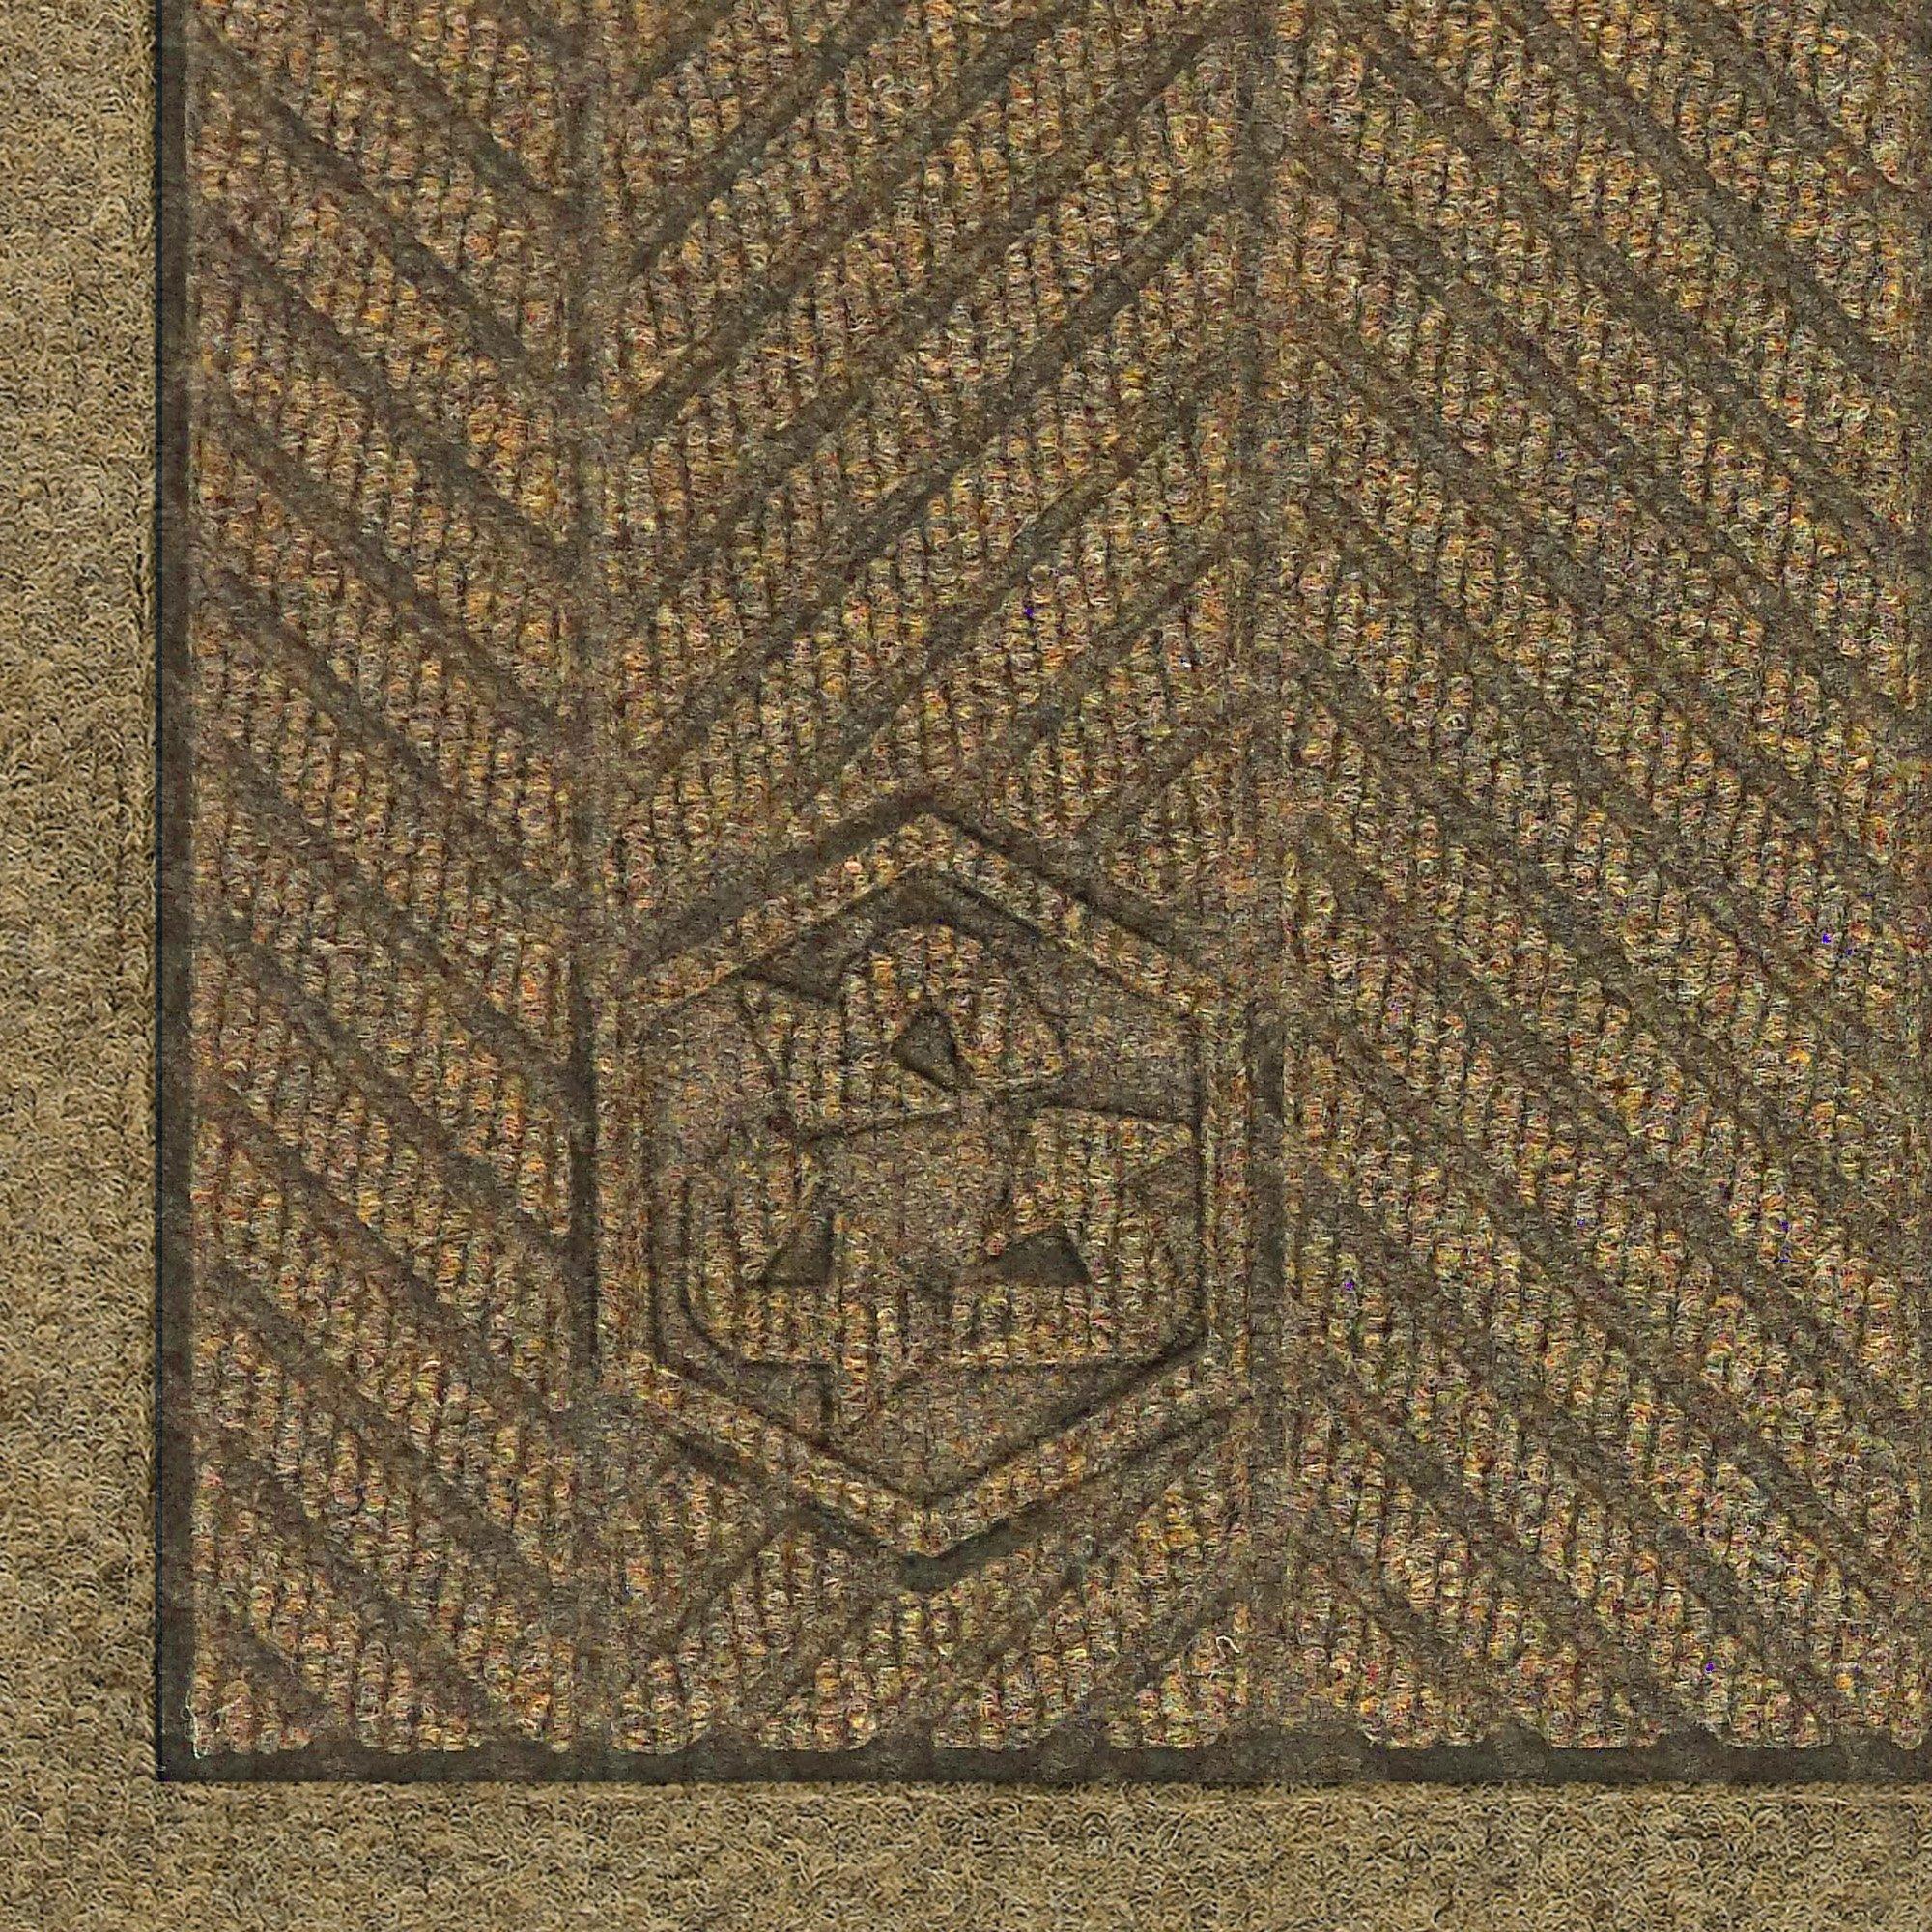 M+A Matting 2241 Waterhog Fashion ECO Elite PET Polyester Entrance Indoor Floor Mat, SBR Rubber Backing, 6' Length x 4' Width, 3/8'' Thick, Khaki